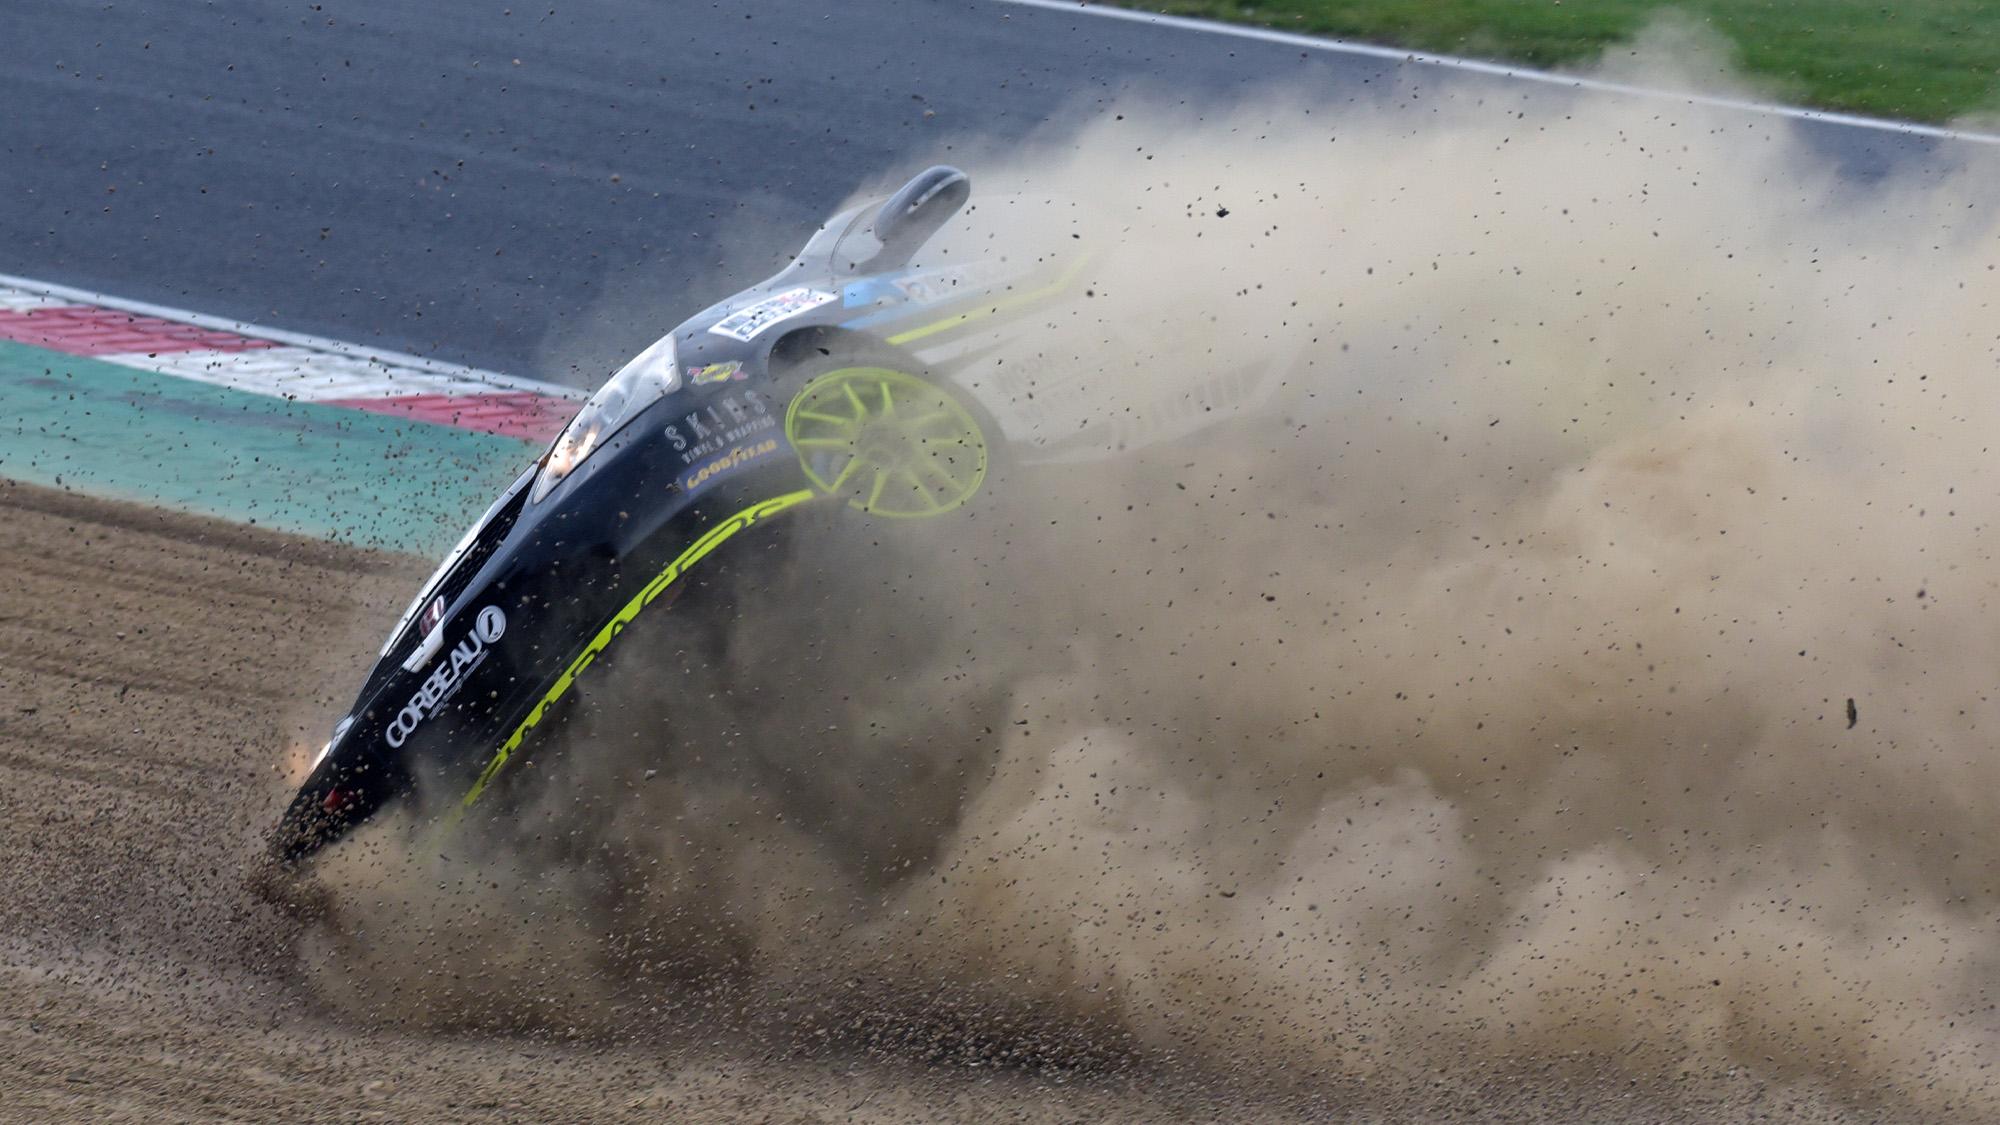 Honda Civic of Ben Sharpe rolls in the gravel at Brands Hatch